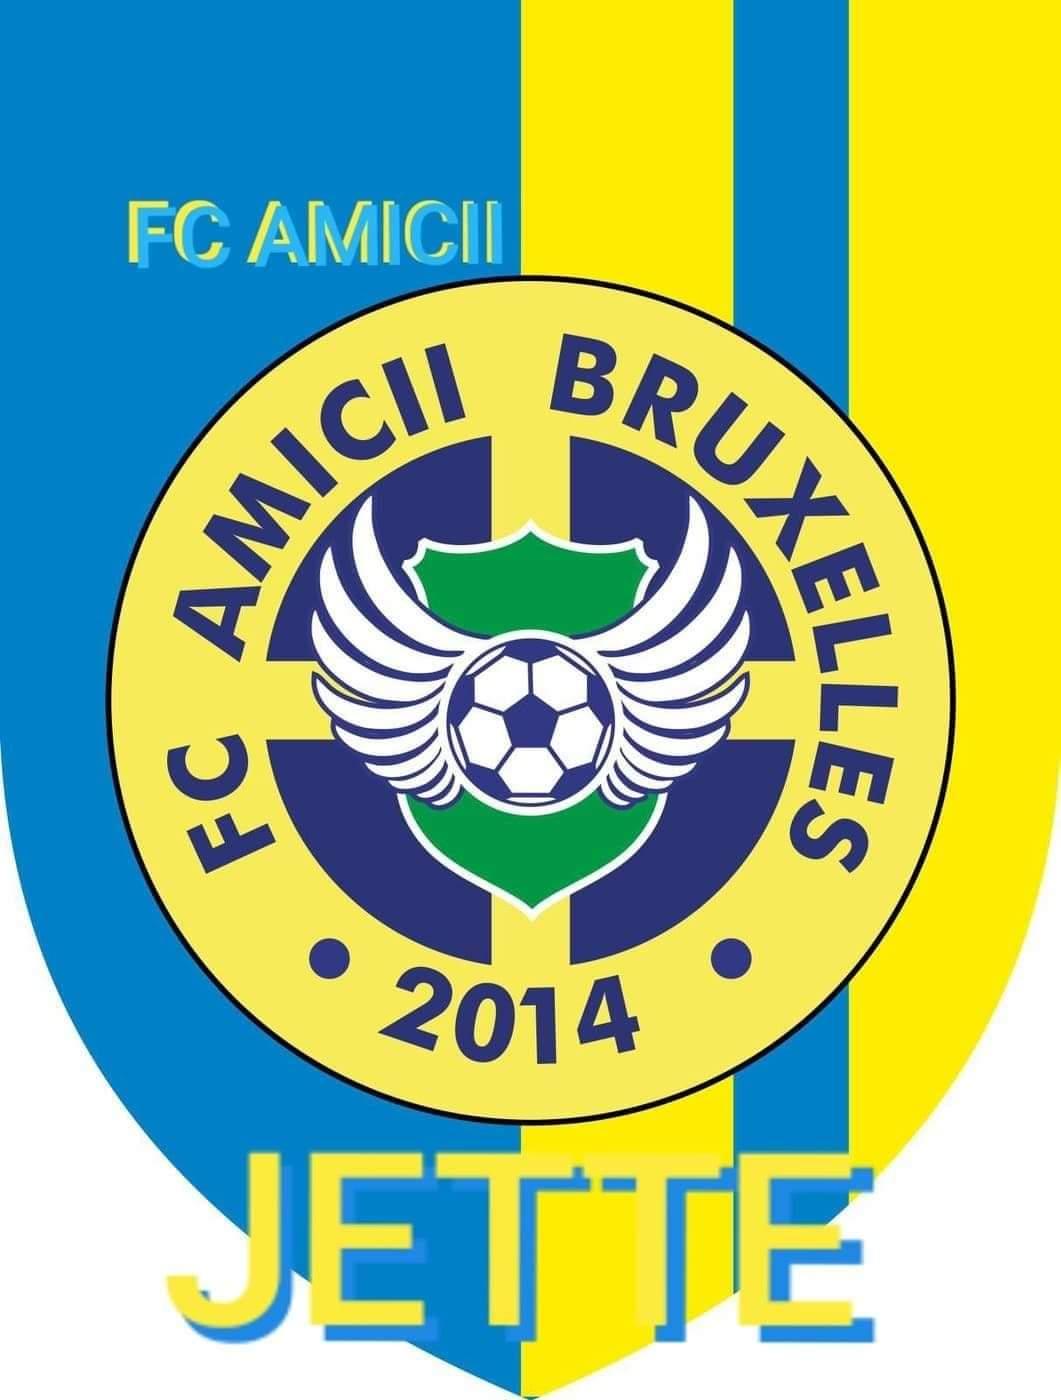 3 - FC.Amicii Bxl Jette